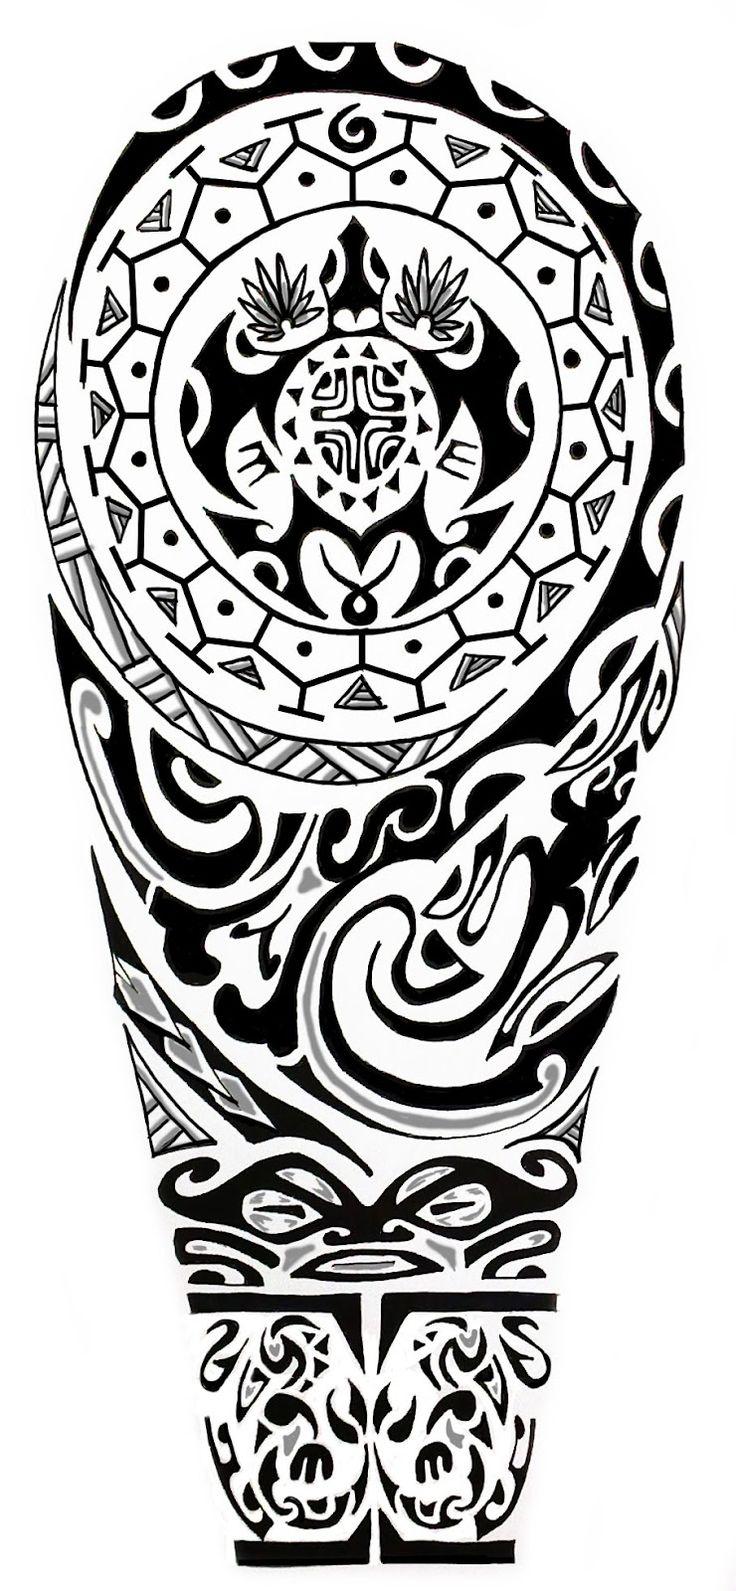 Maori Tribal Tattoos Powerful: 460 Best Images About Tattoo Maori Tribal On Pinterest